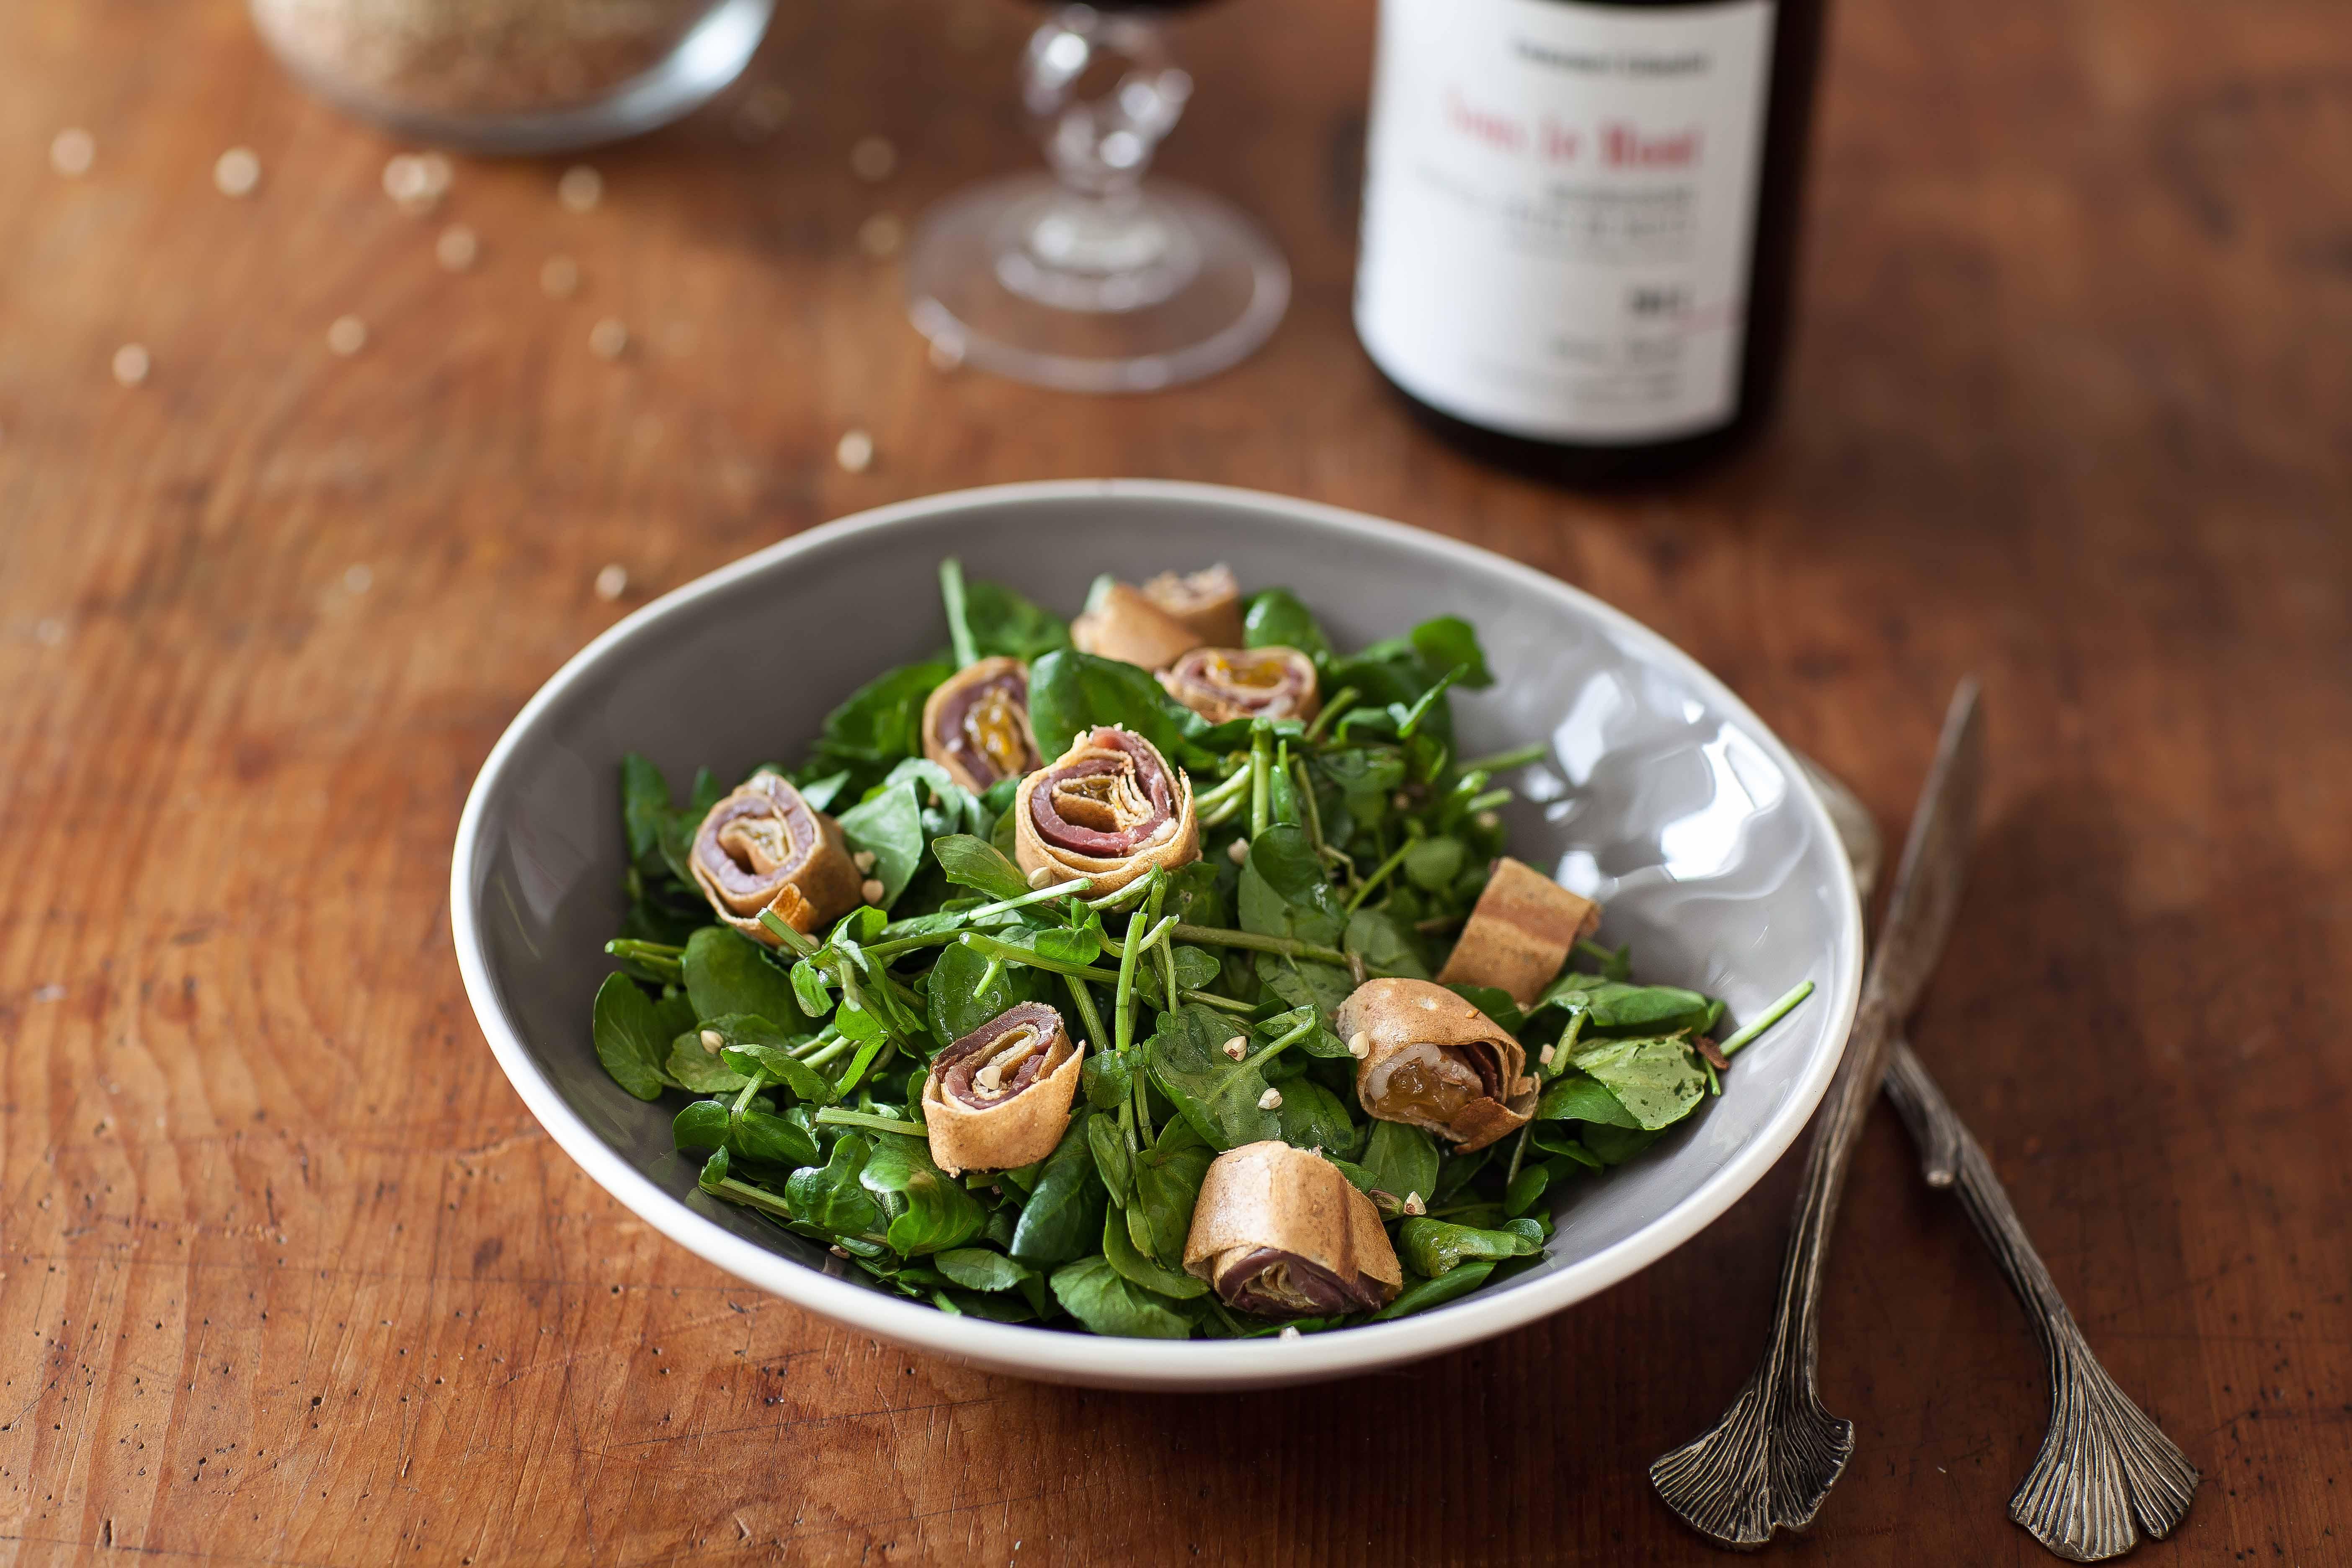 salade cresson crepe canard recette